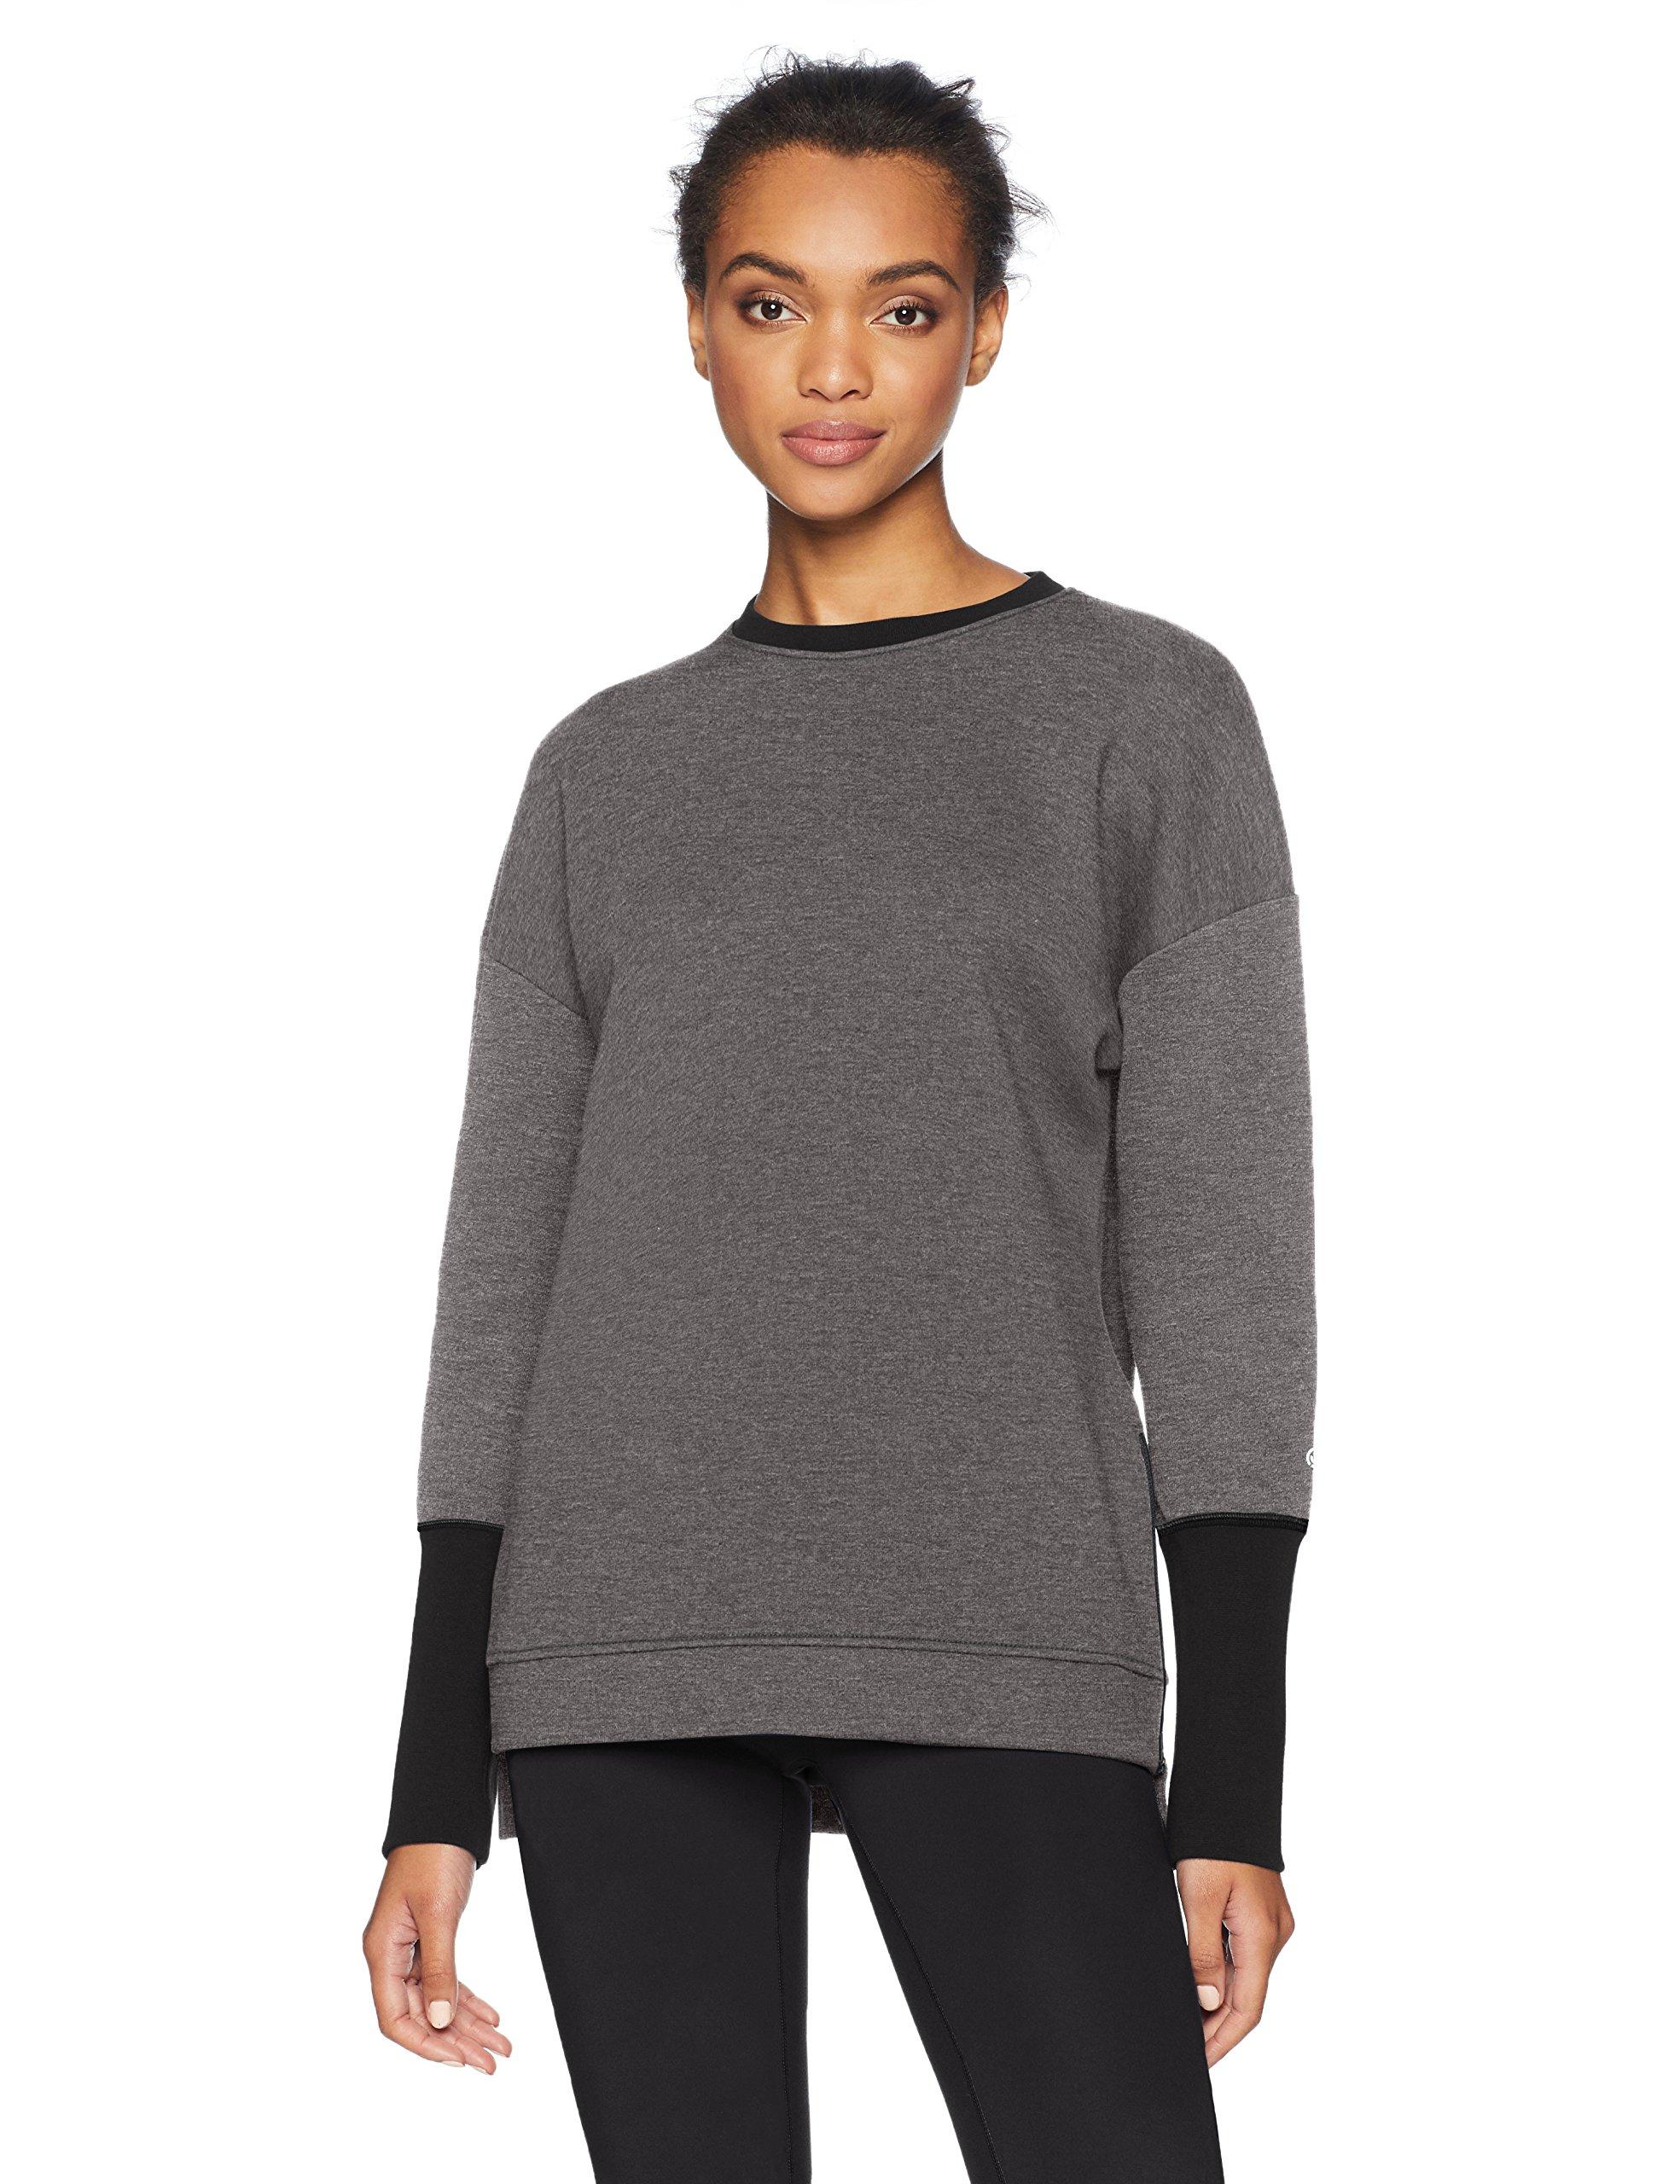 Core 10 Women's Motion Tech Fleece Relaxed Fit Long Sleeve Crew Sweatshirt, Medium Grey Heather, S (4-6)